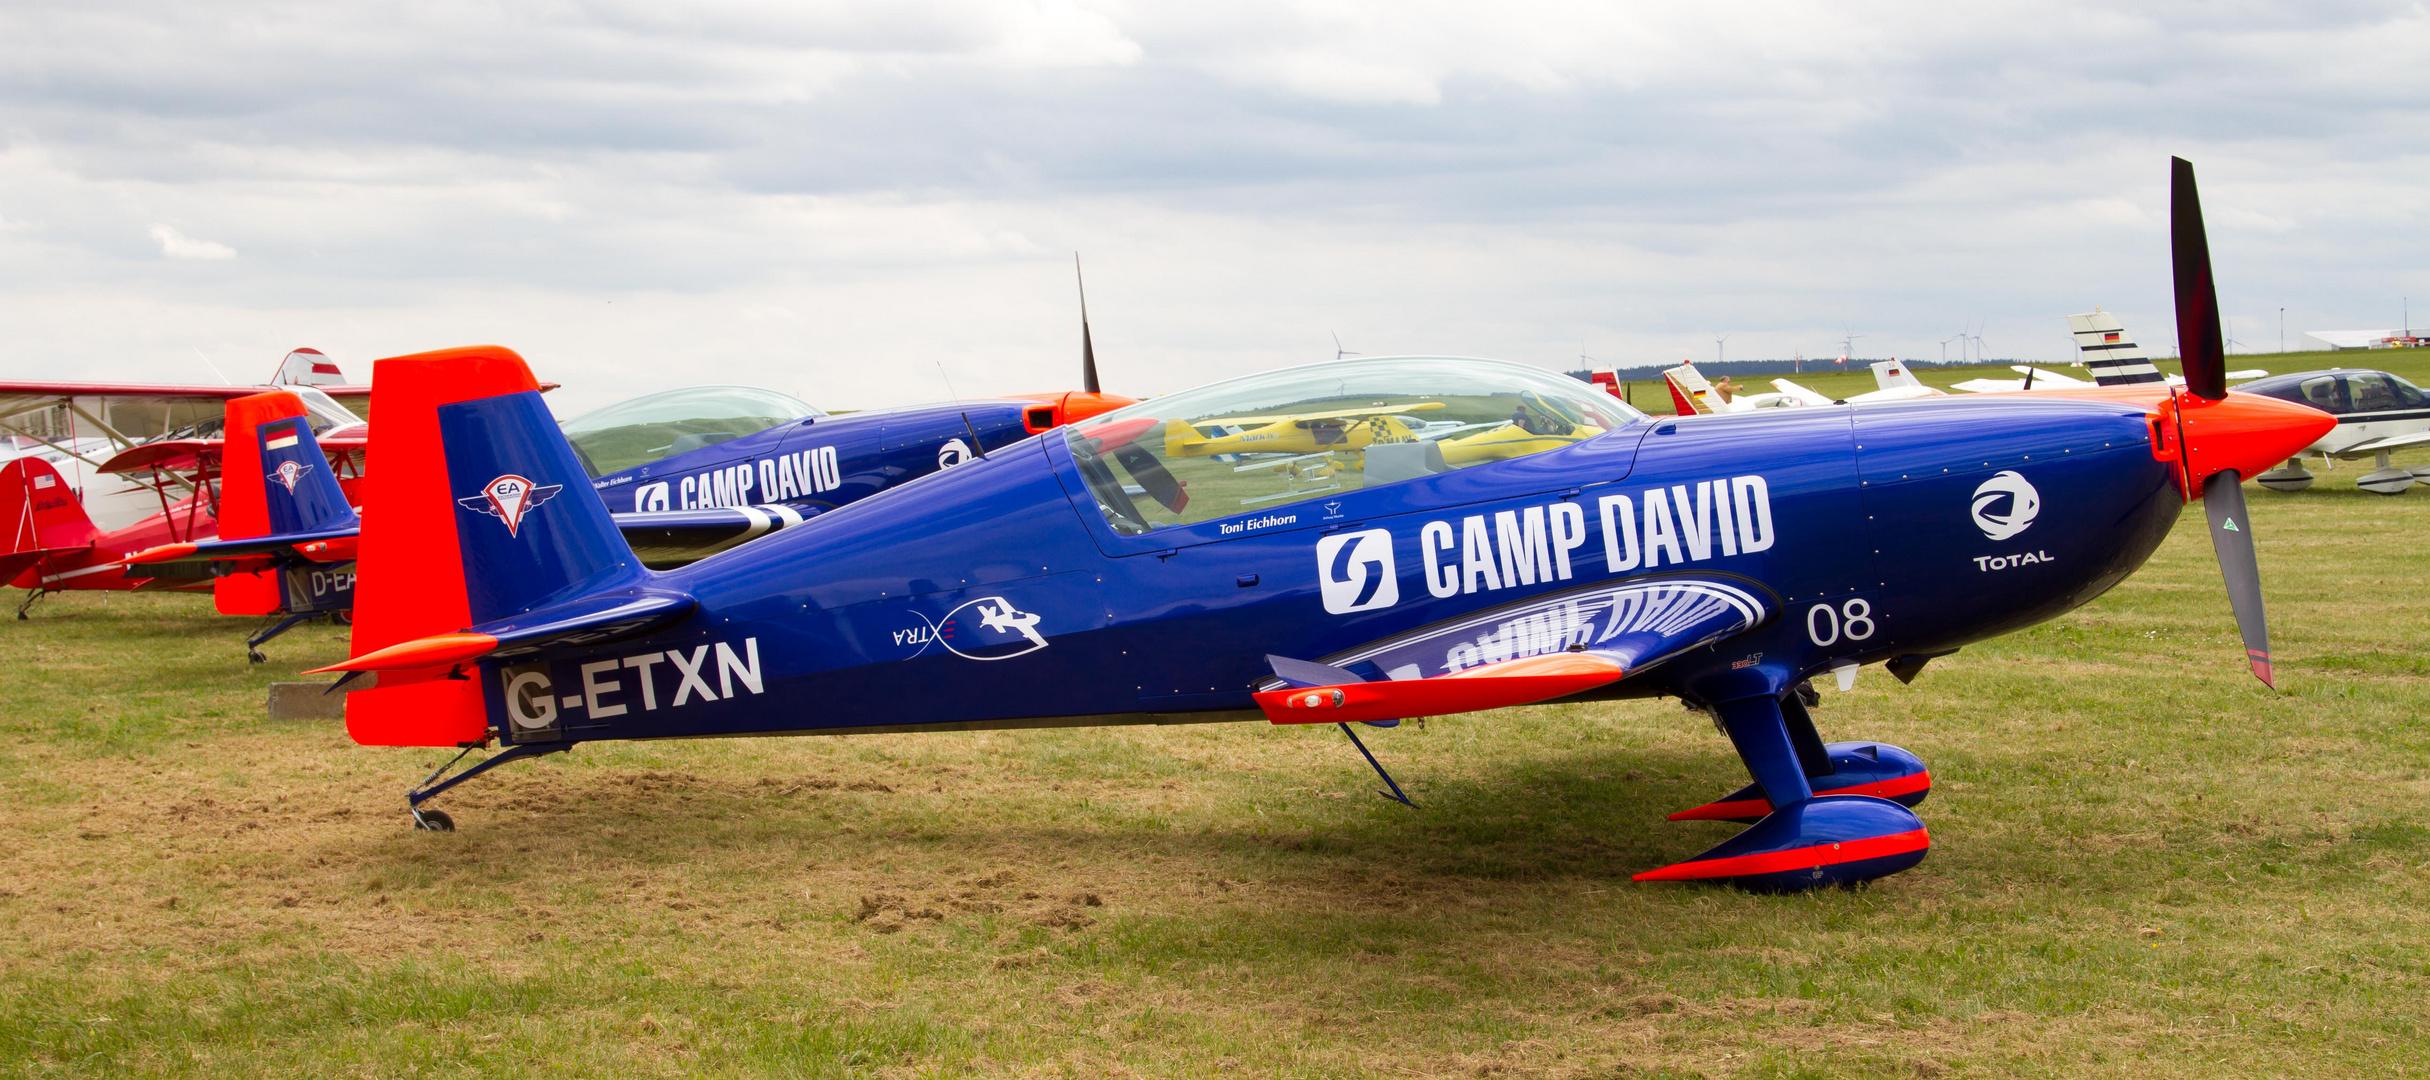 - CAMP DAVID EA 330 LT - Walter und Toni Eichhorn